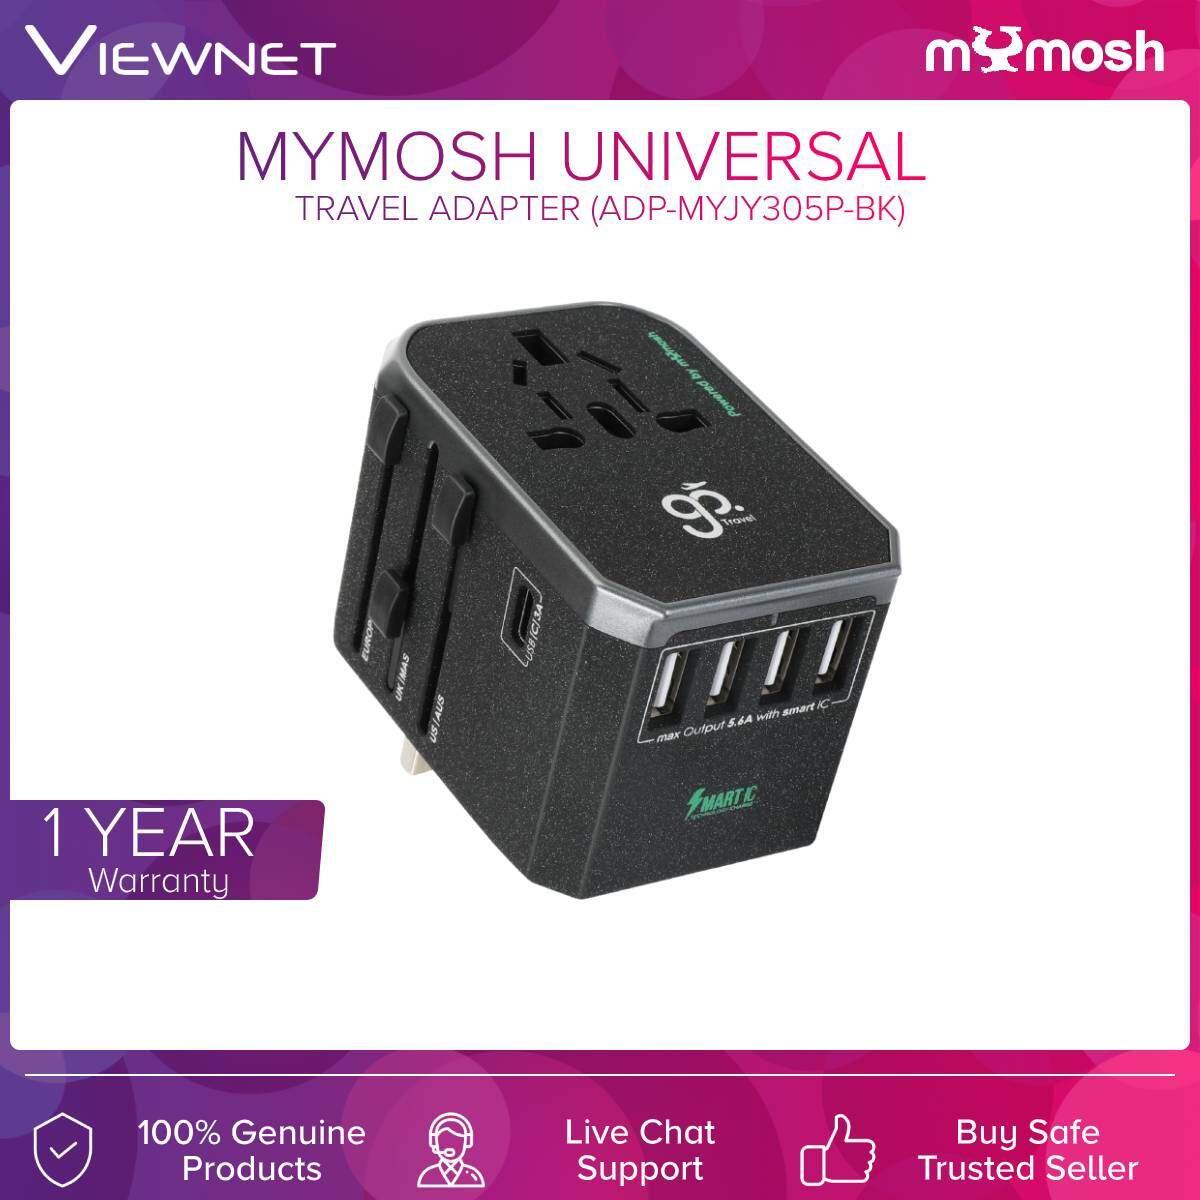 Mymosh Adapter Ac Universal 1-Type-C + 4-Usb 5.6A (ADP-MYJY305P-BK) BLK